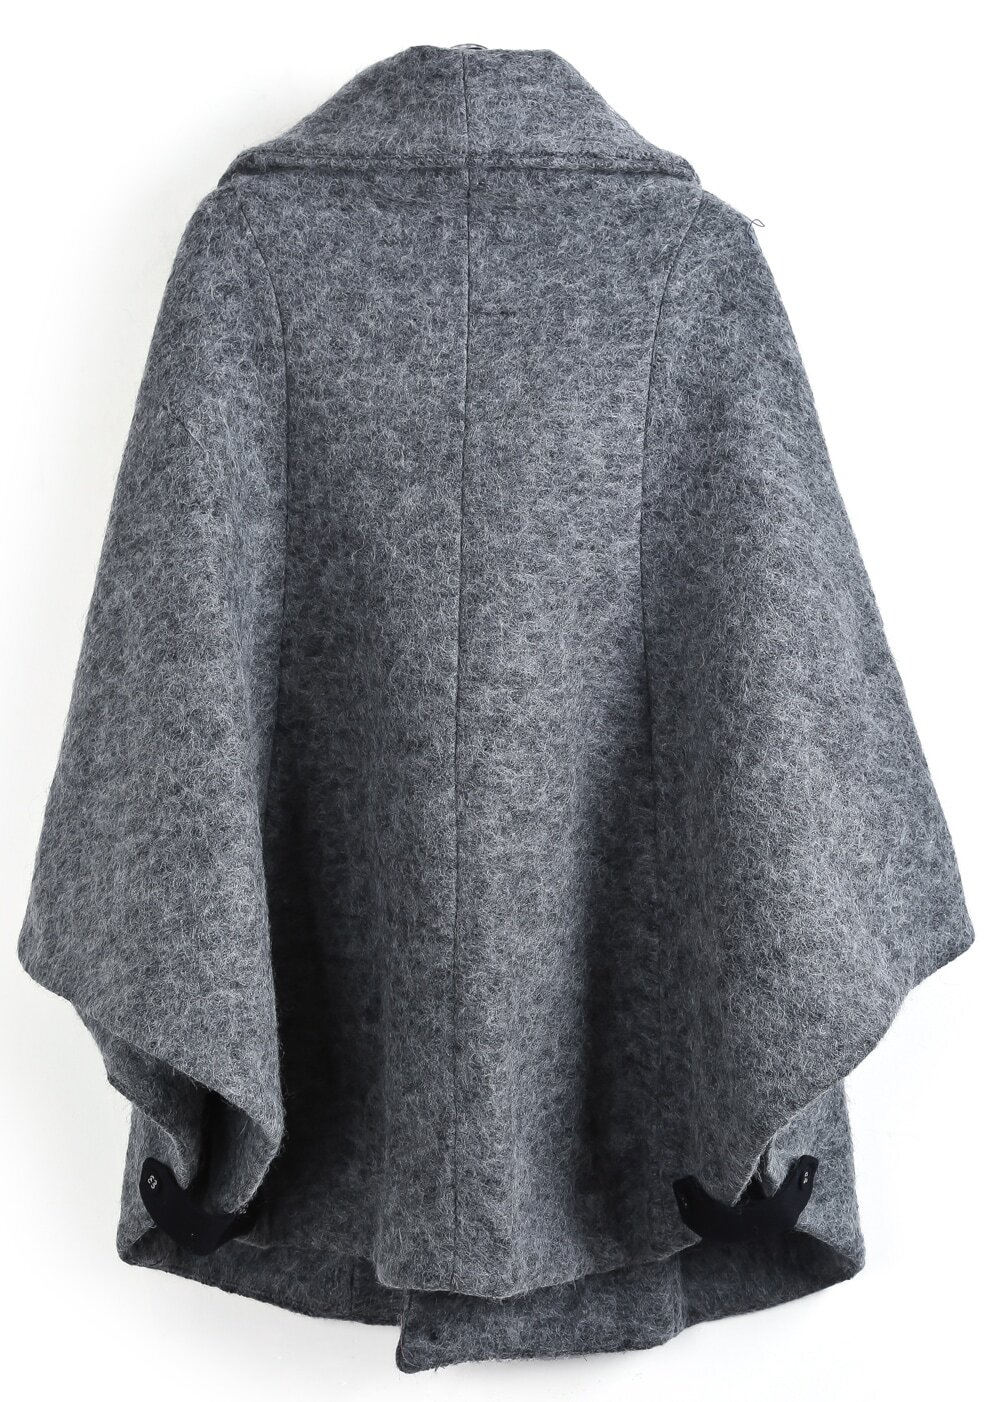 Grey Lapel Long Sleeve Tweed Cape Coat -SheIn(Sheinside)